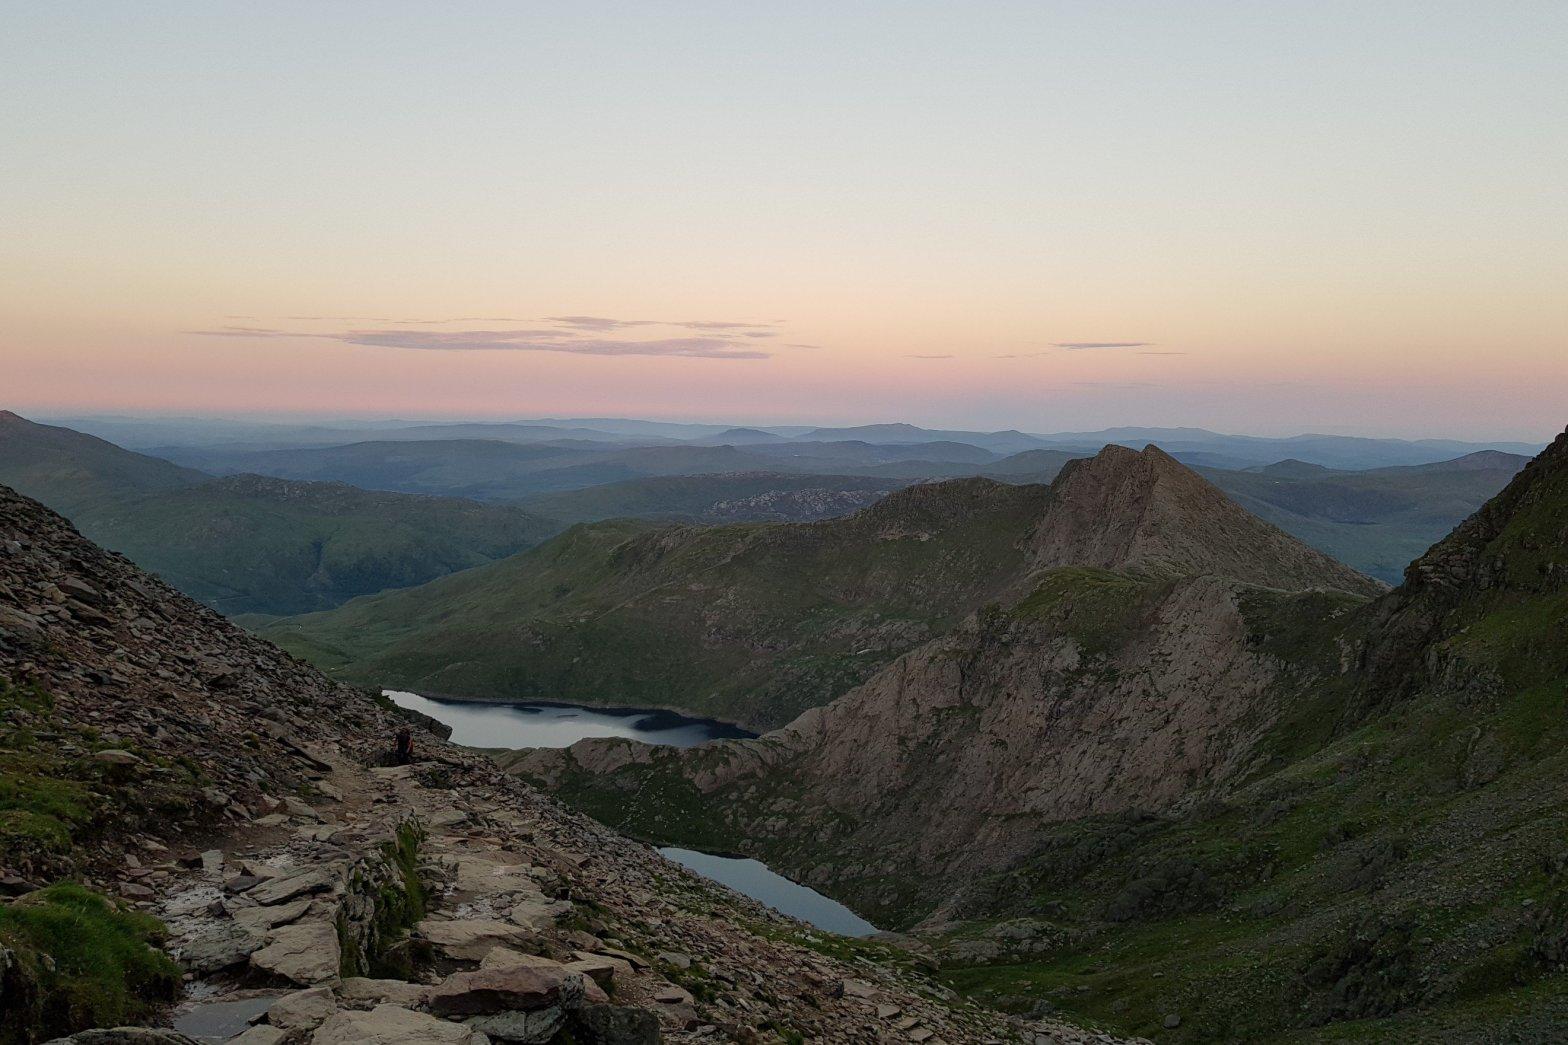 Sunset from the summit of Snowdon